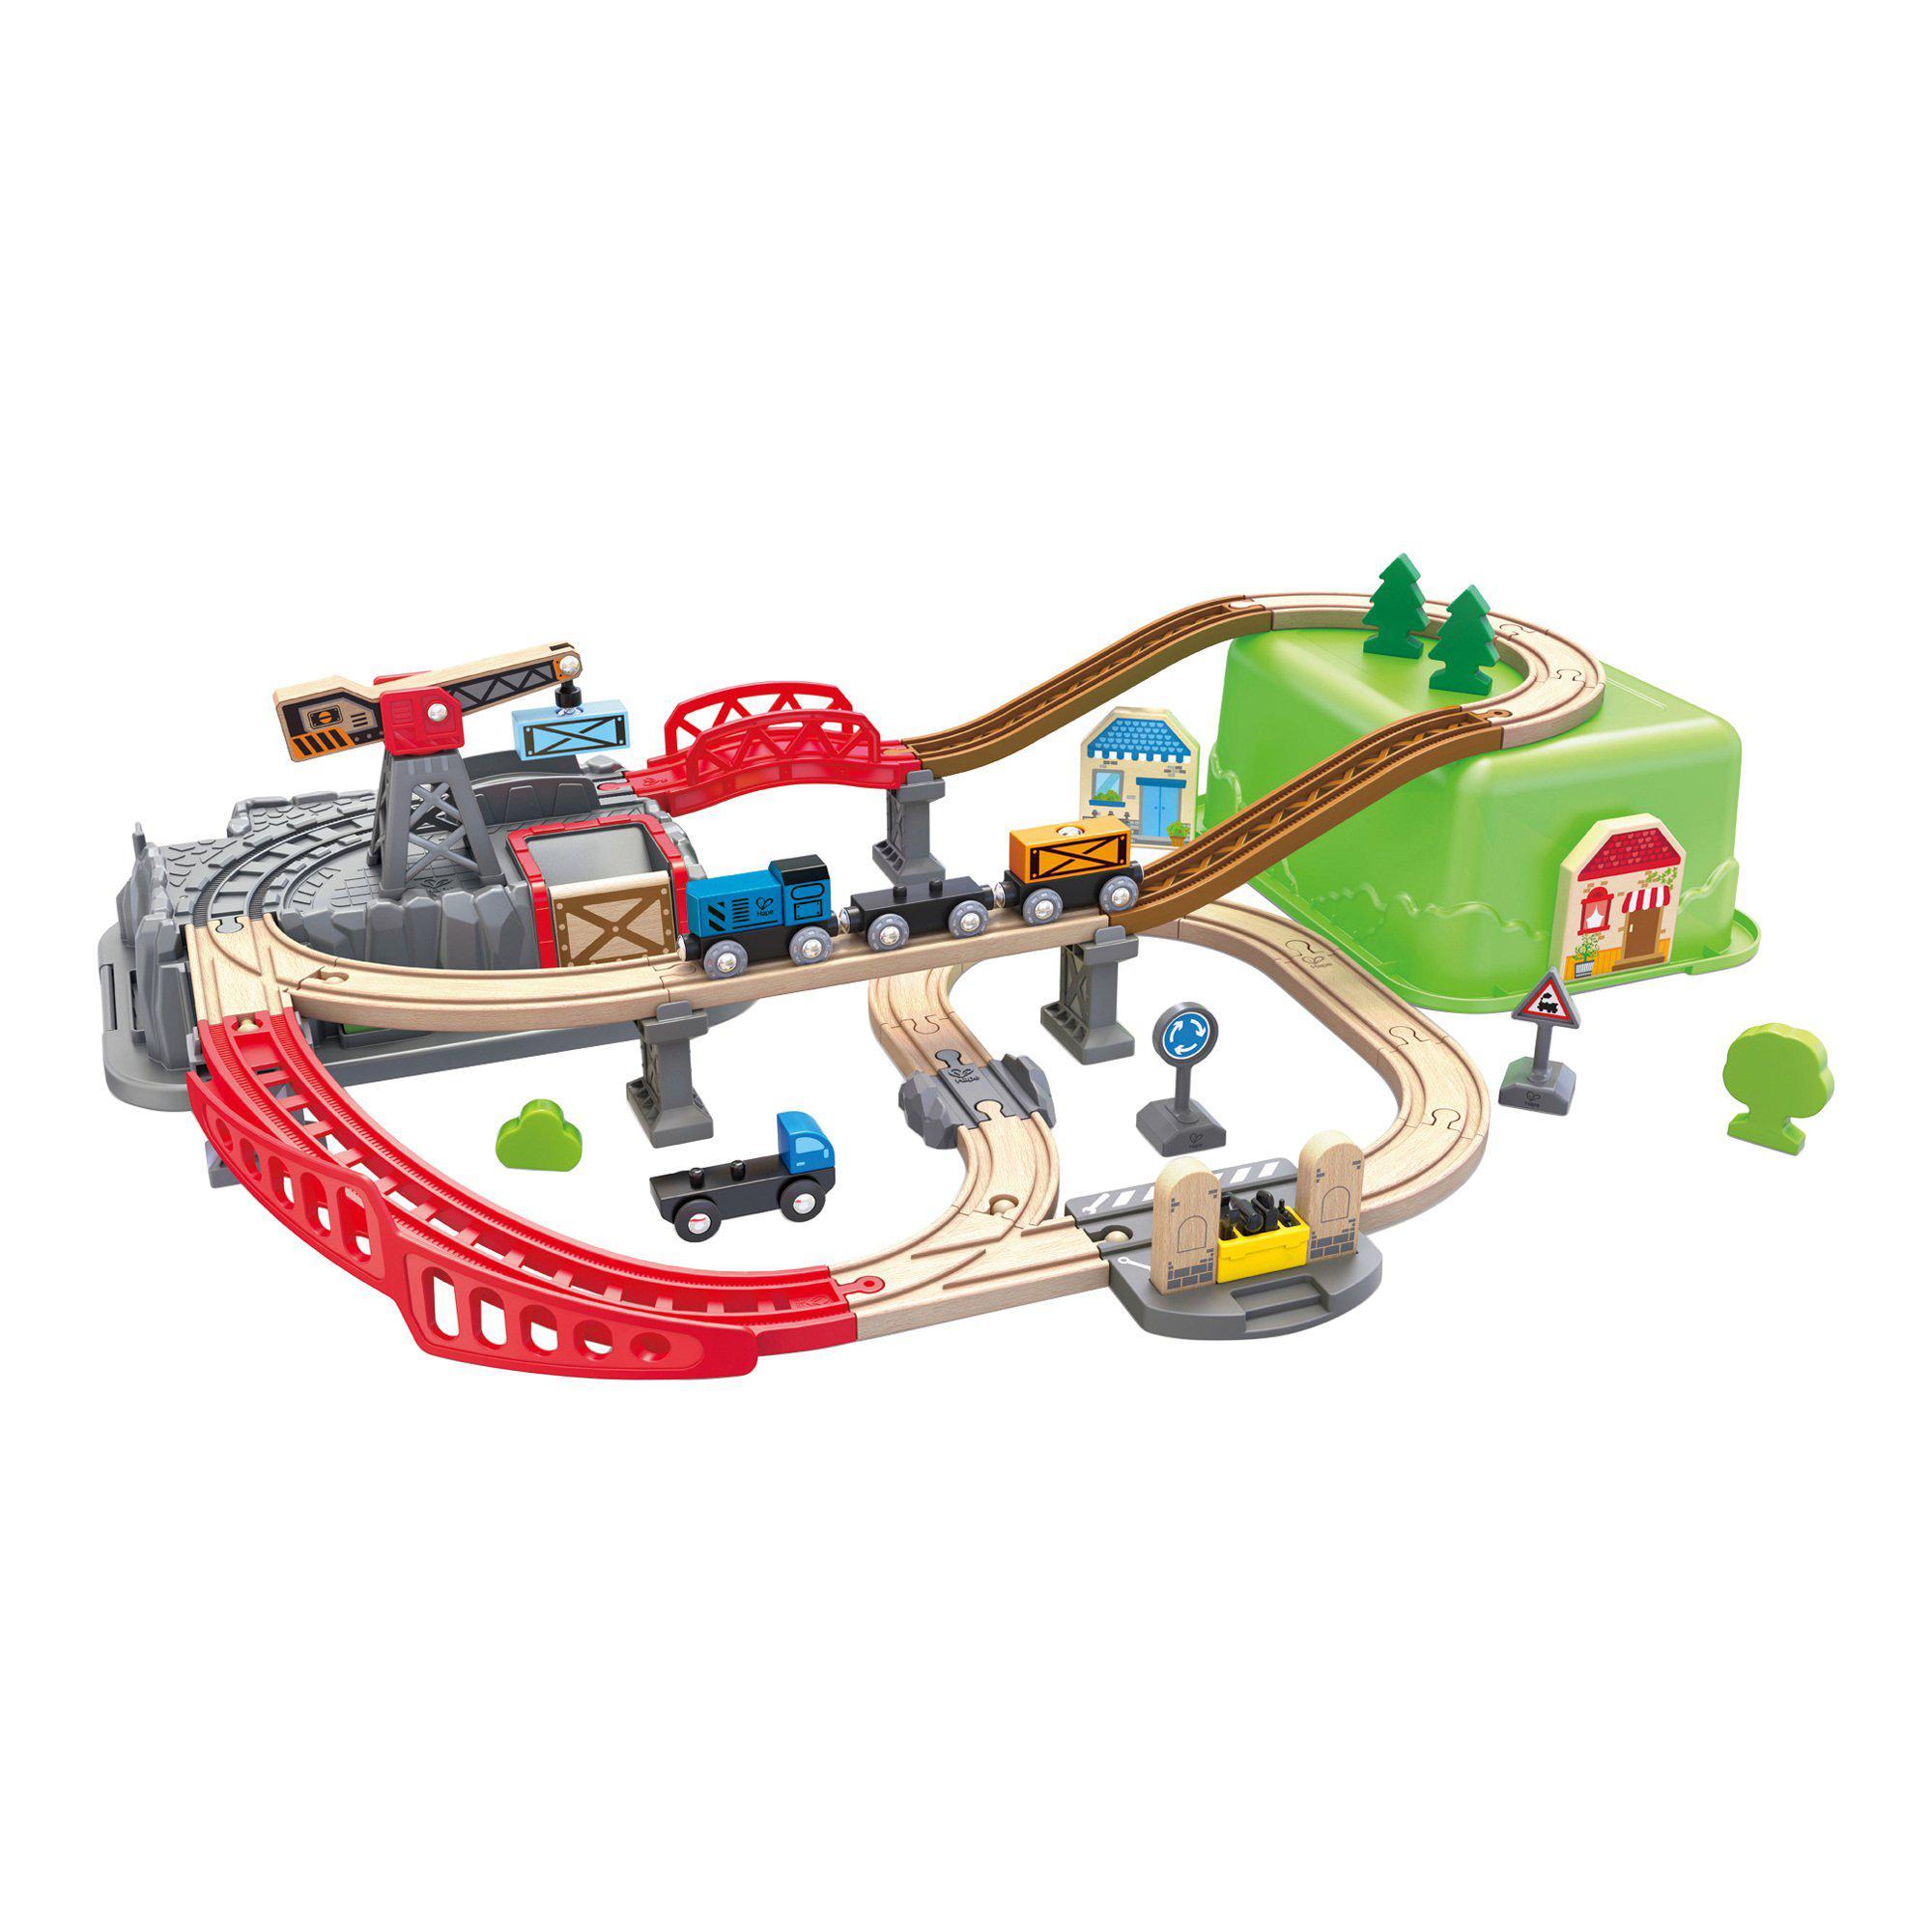 Eisenbahn Baukasten-Set